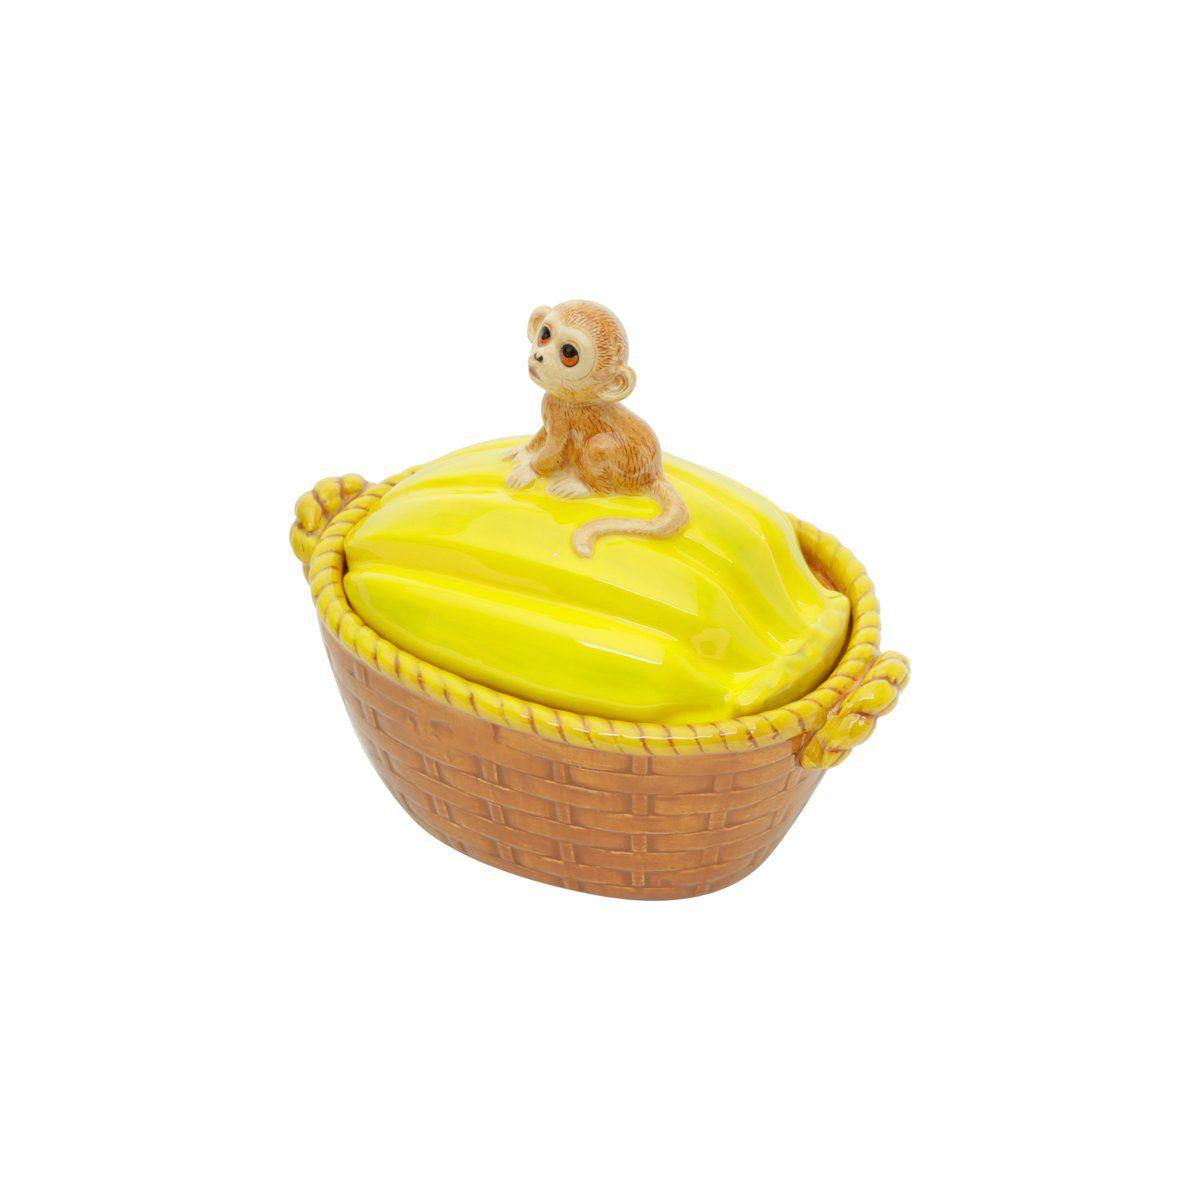 Pote 19,5 X 12,5 cm de cerâmica amarela com tampa Banana Rojemac - 26800